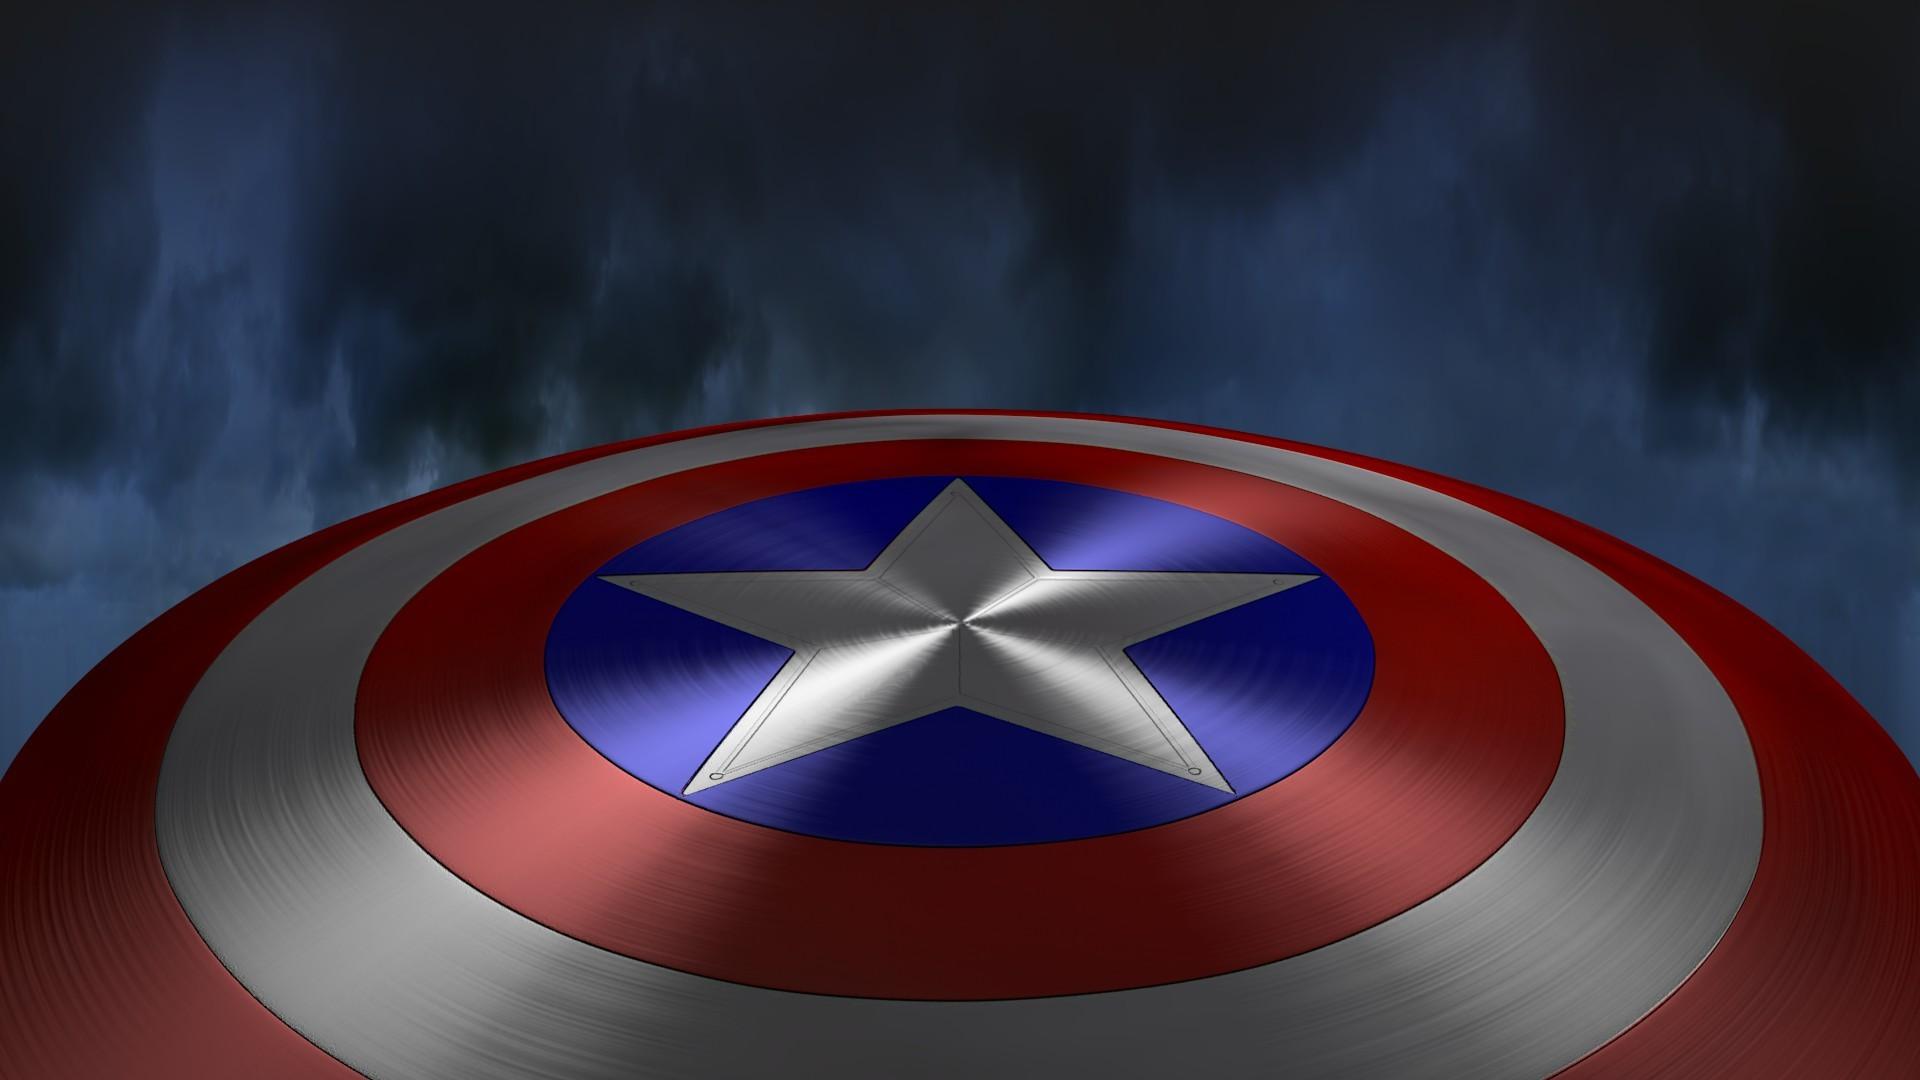 щит капитана америки фото